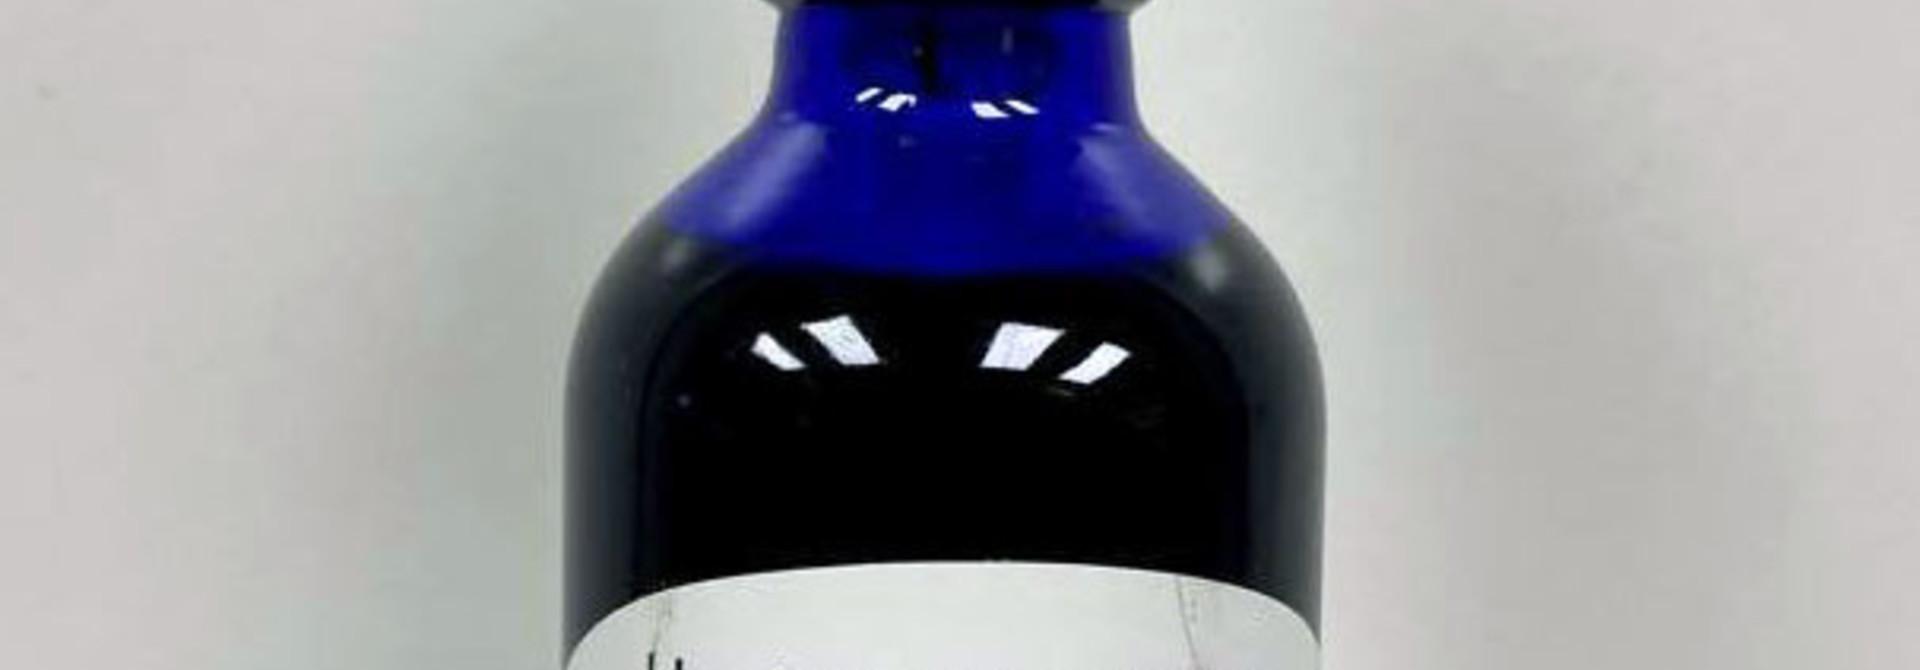 Natural 2oz Cedar & Sage Sanitizer Spray